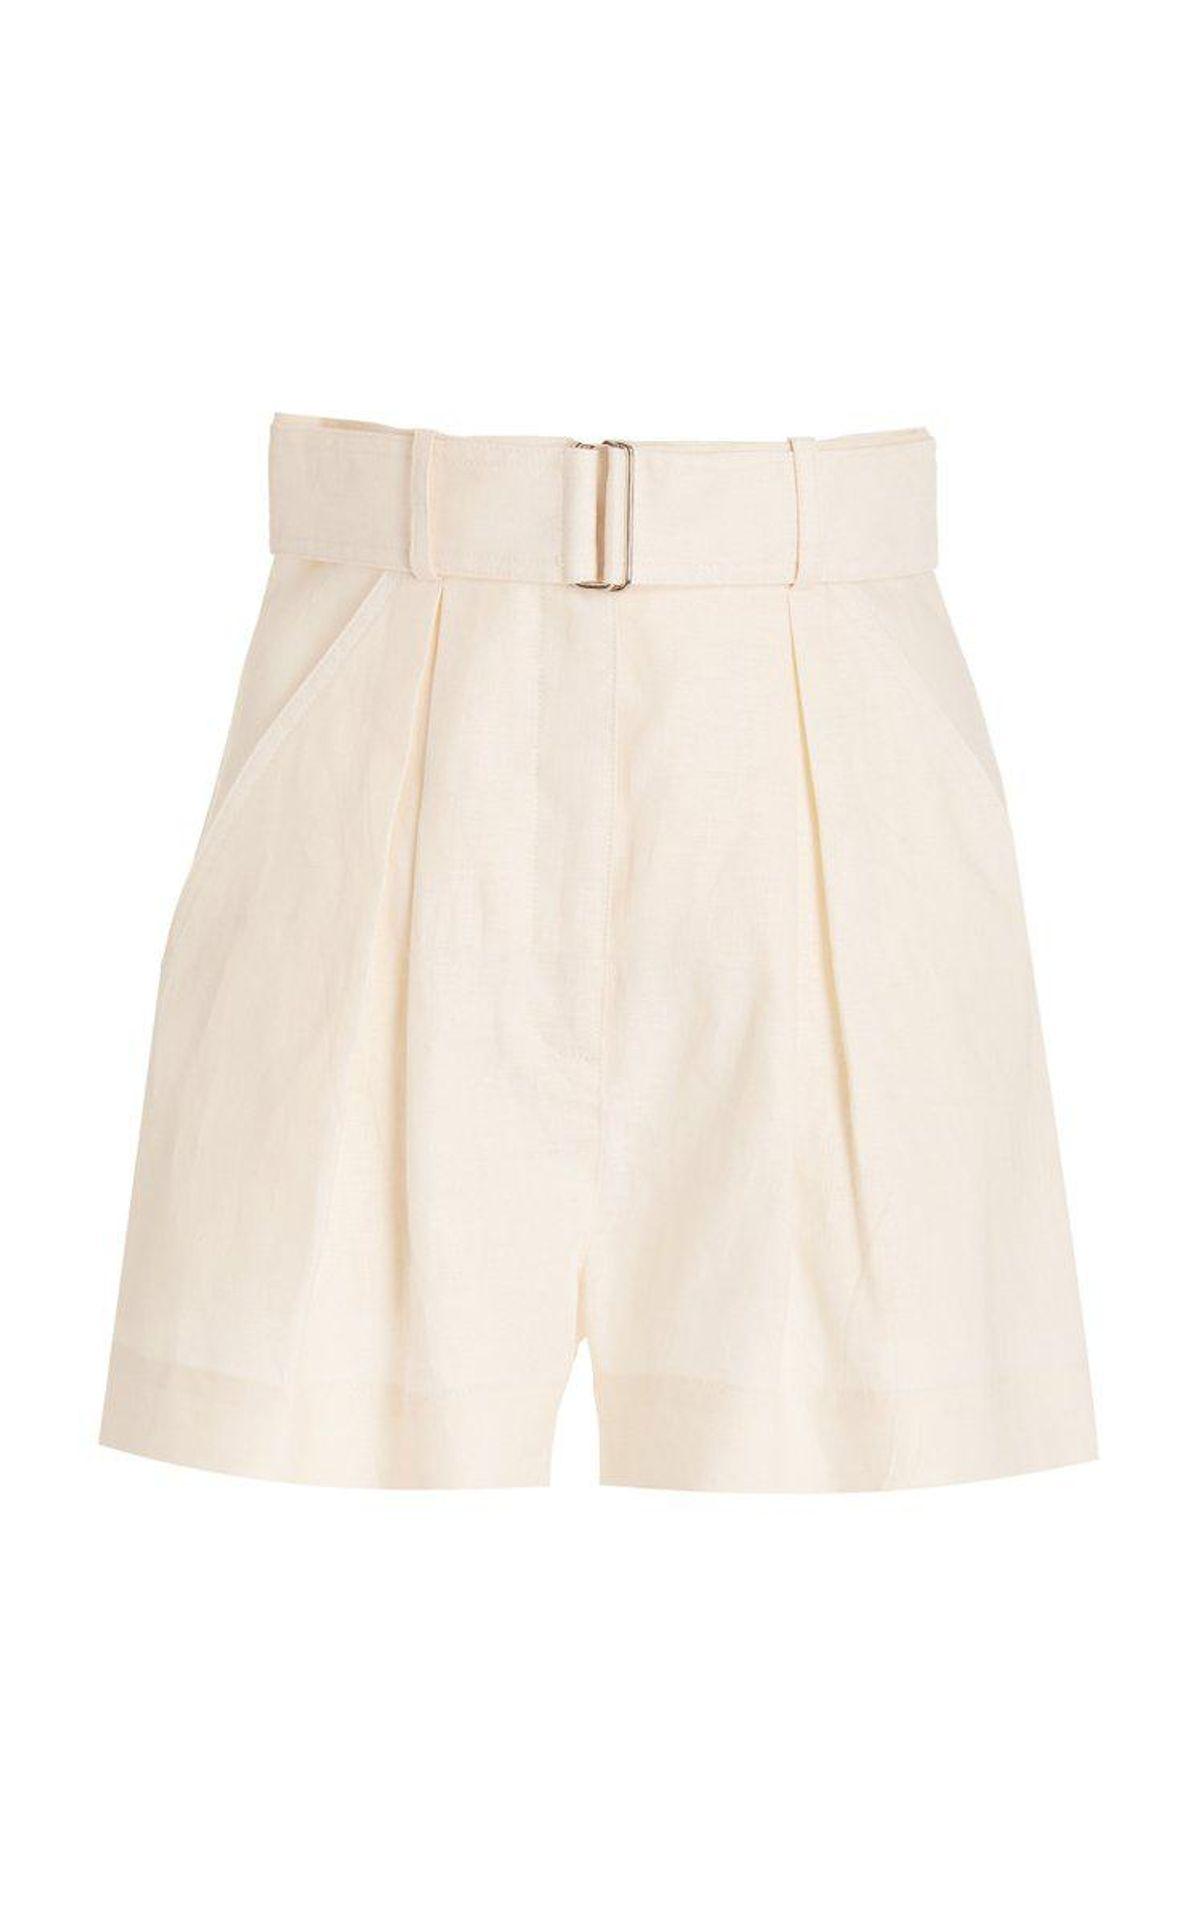 matthew burch exclusive pleated linen shorts